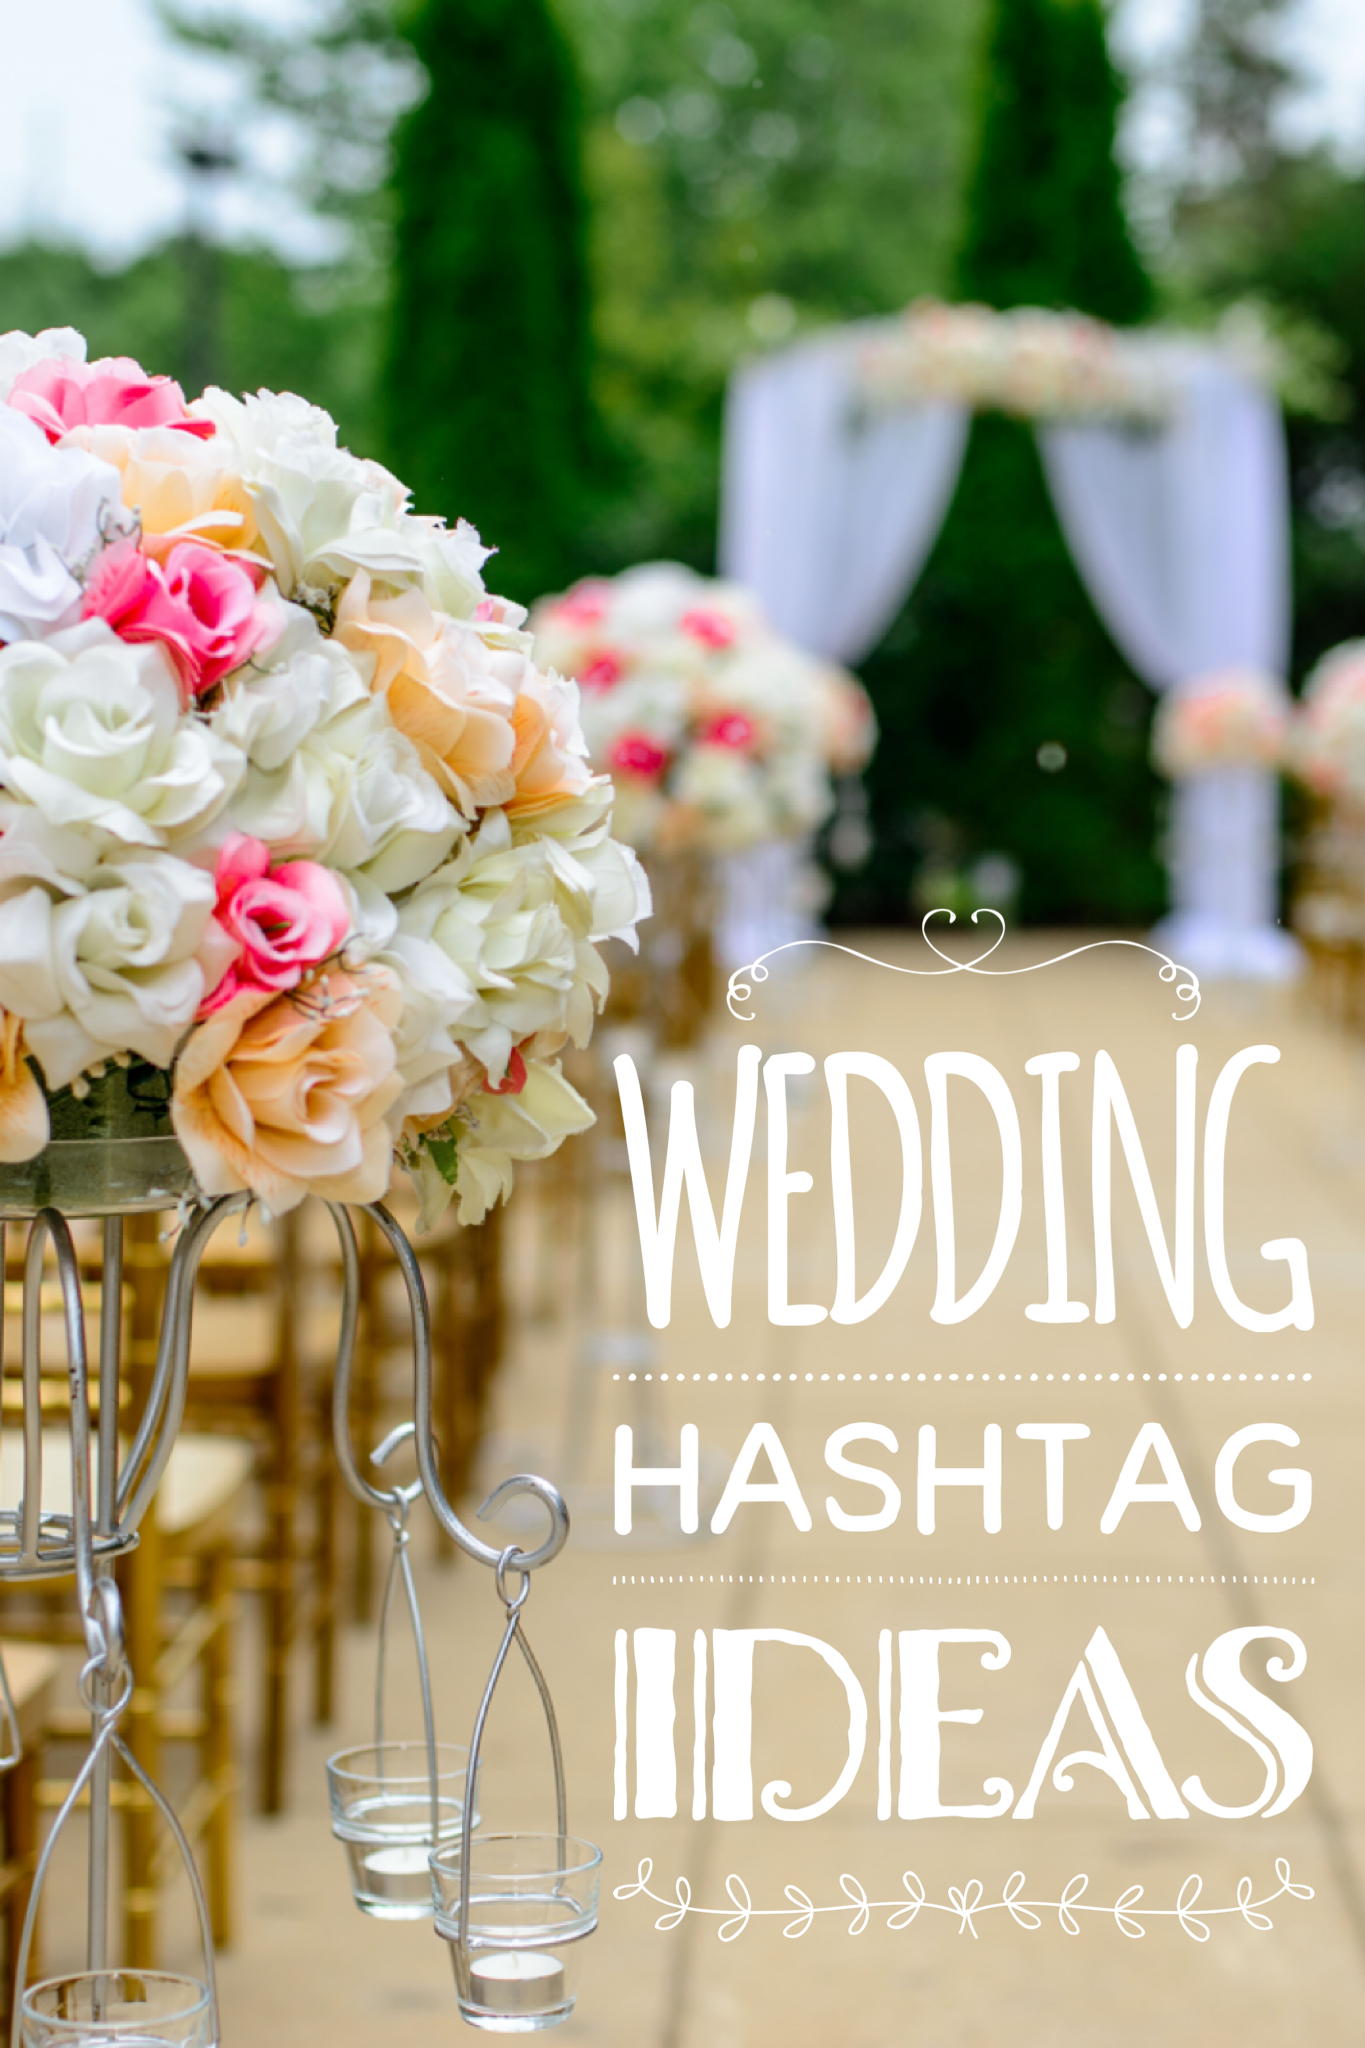 Wedding Hashtag Generator Wedding hashtag generator